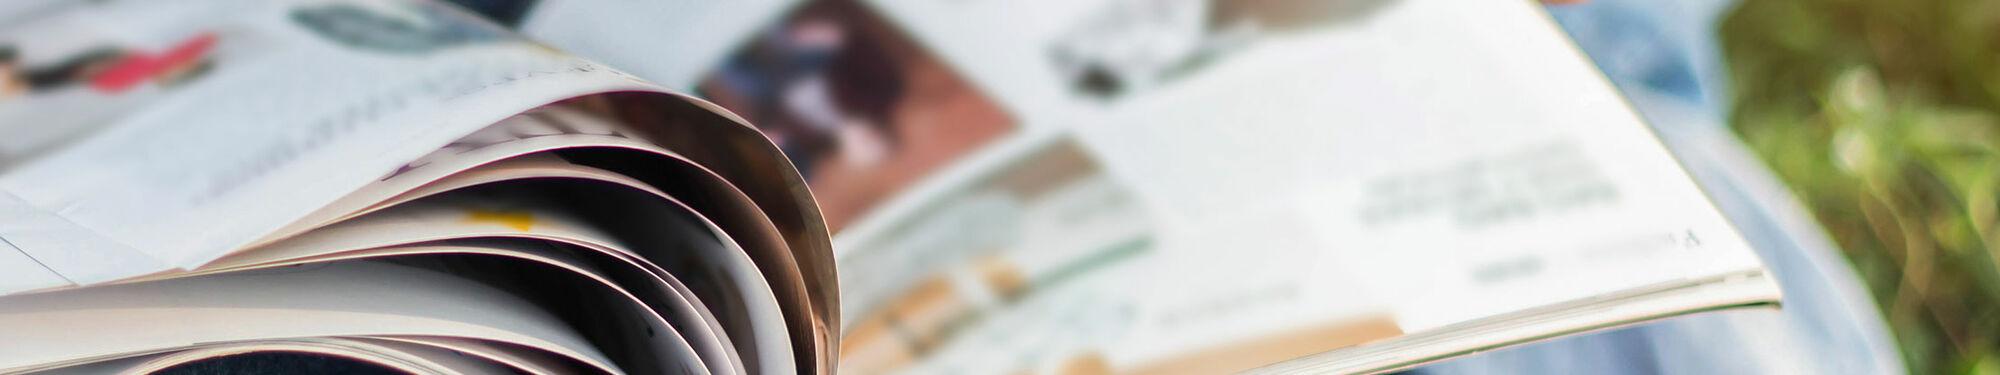 gartenflora ausgabe 10 2018 in der presse webshop. Black Bedroom Furniture Sets. Home Design Ideas